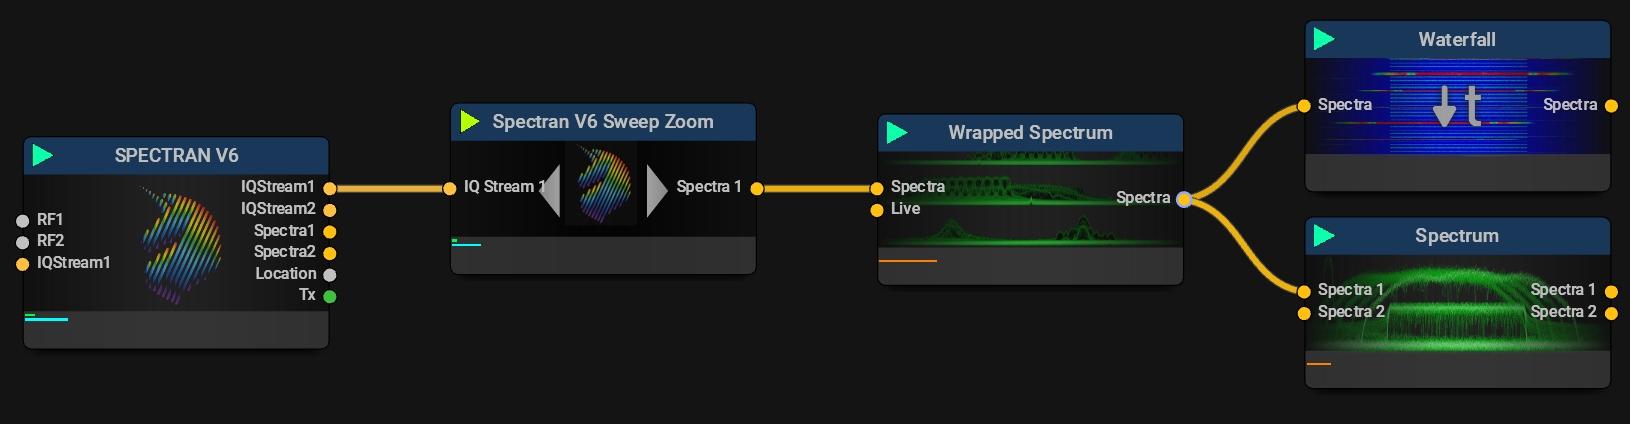 Spectrum Monitoring Mission